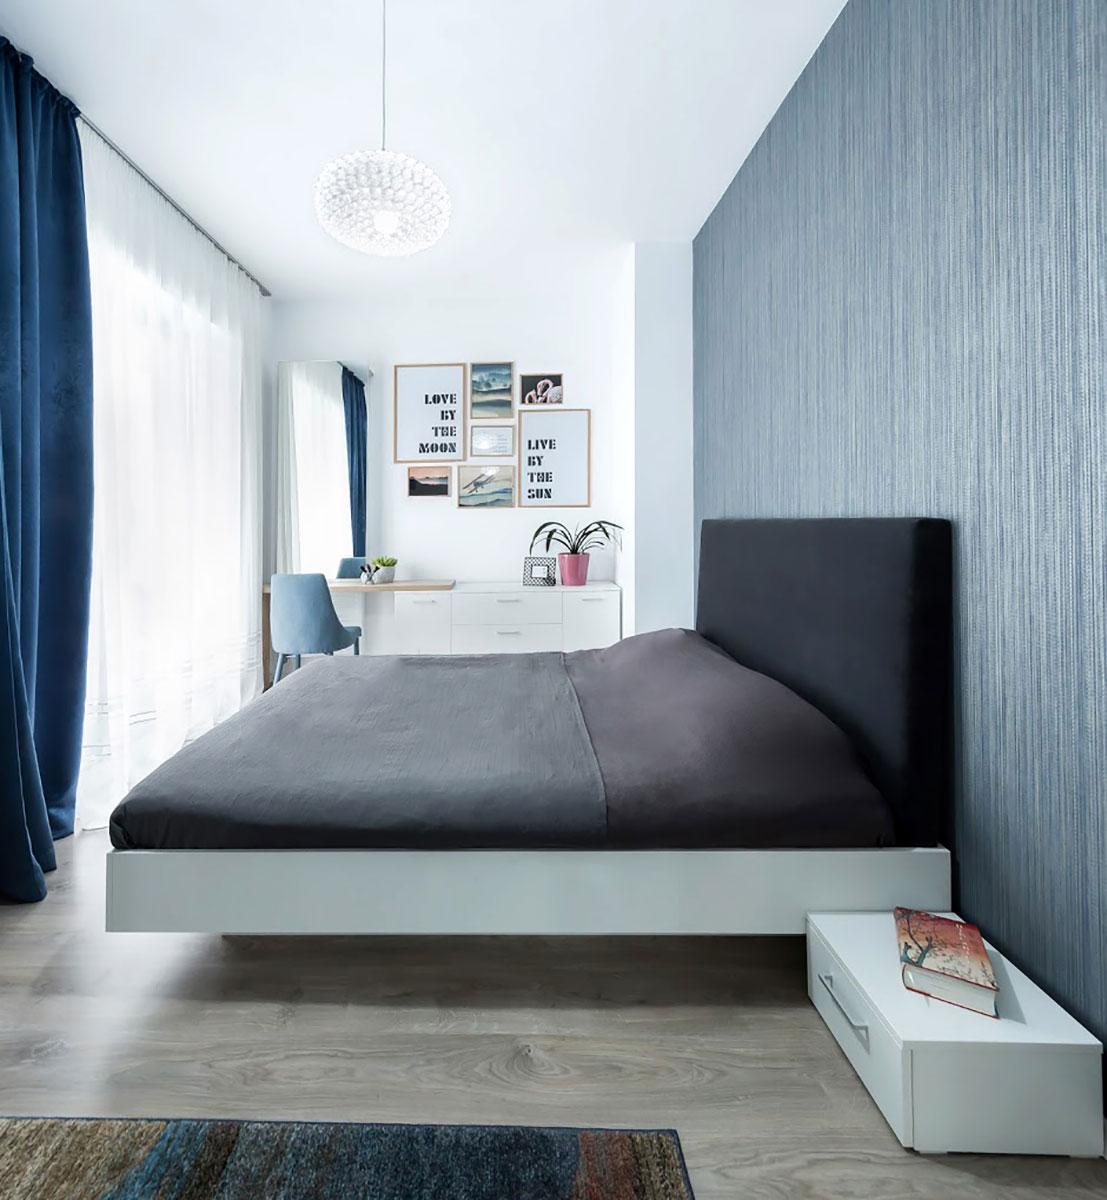 amenajare apartament 3 camere dormitor